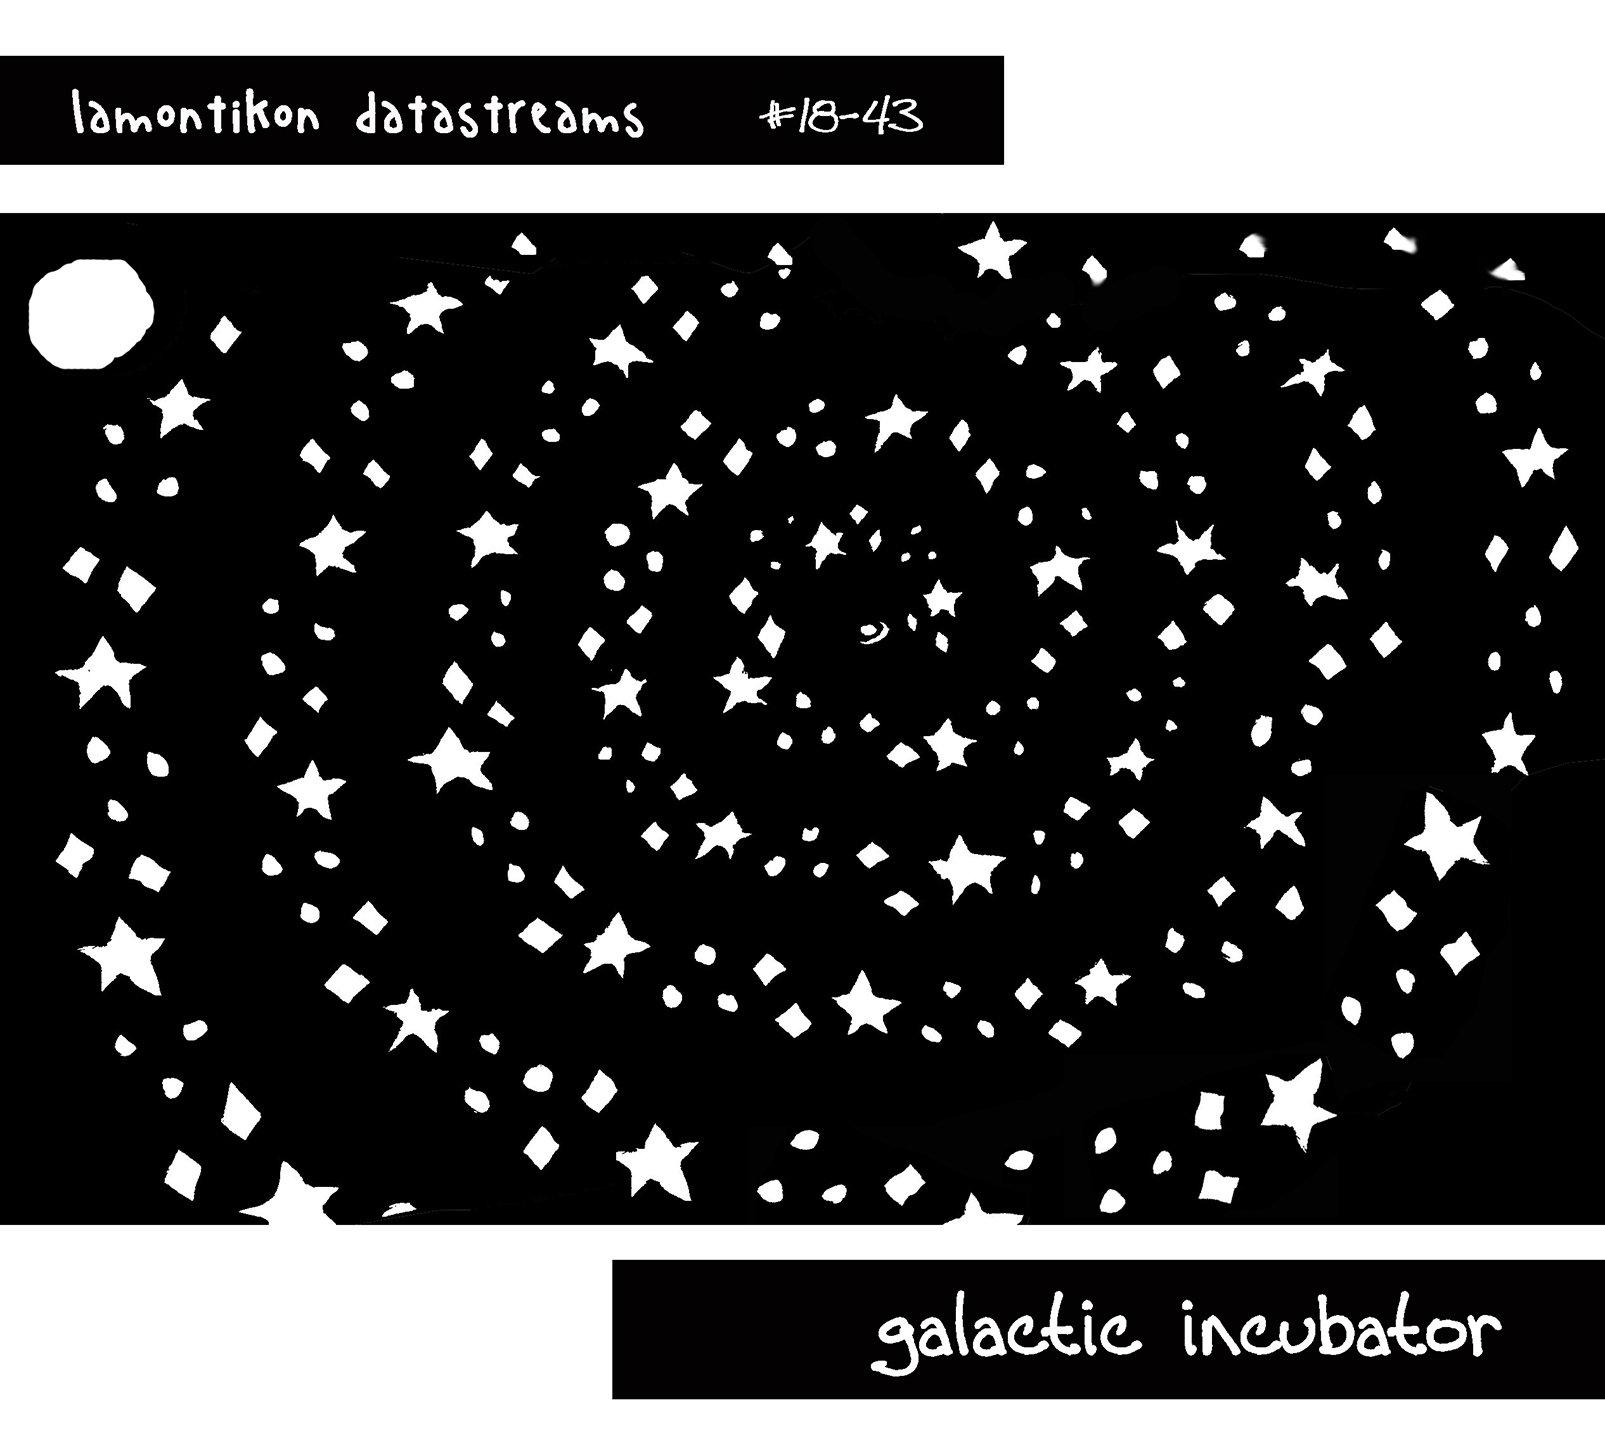 lamontikon - Galactic Incubator - 24 bit Download